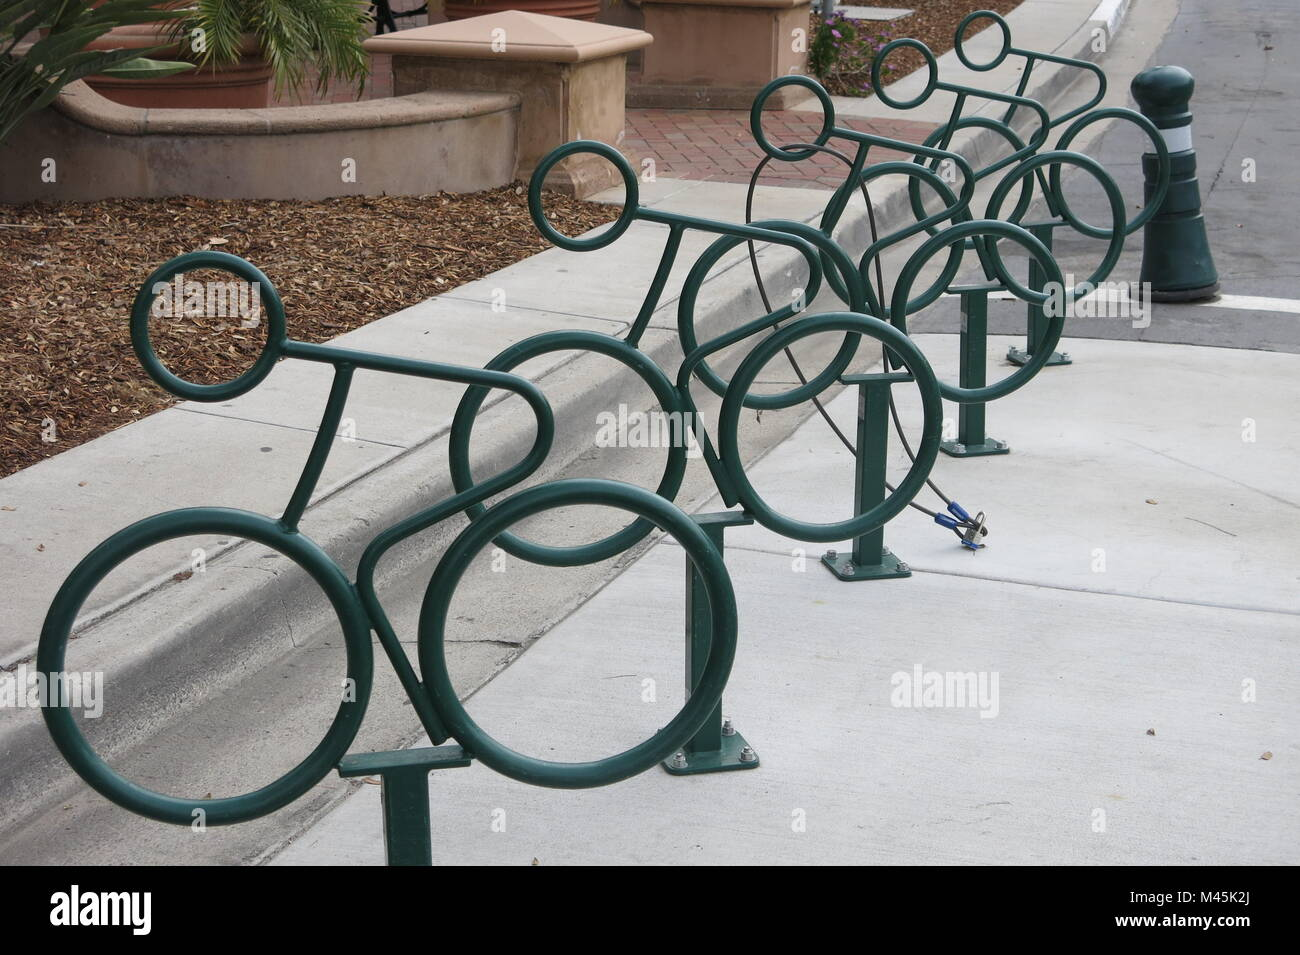 Cycle racks add to the street furniture on Coronado Island, San Diego Stock Photo